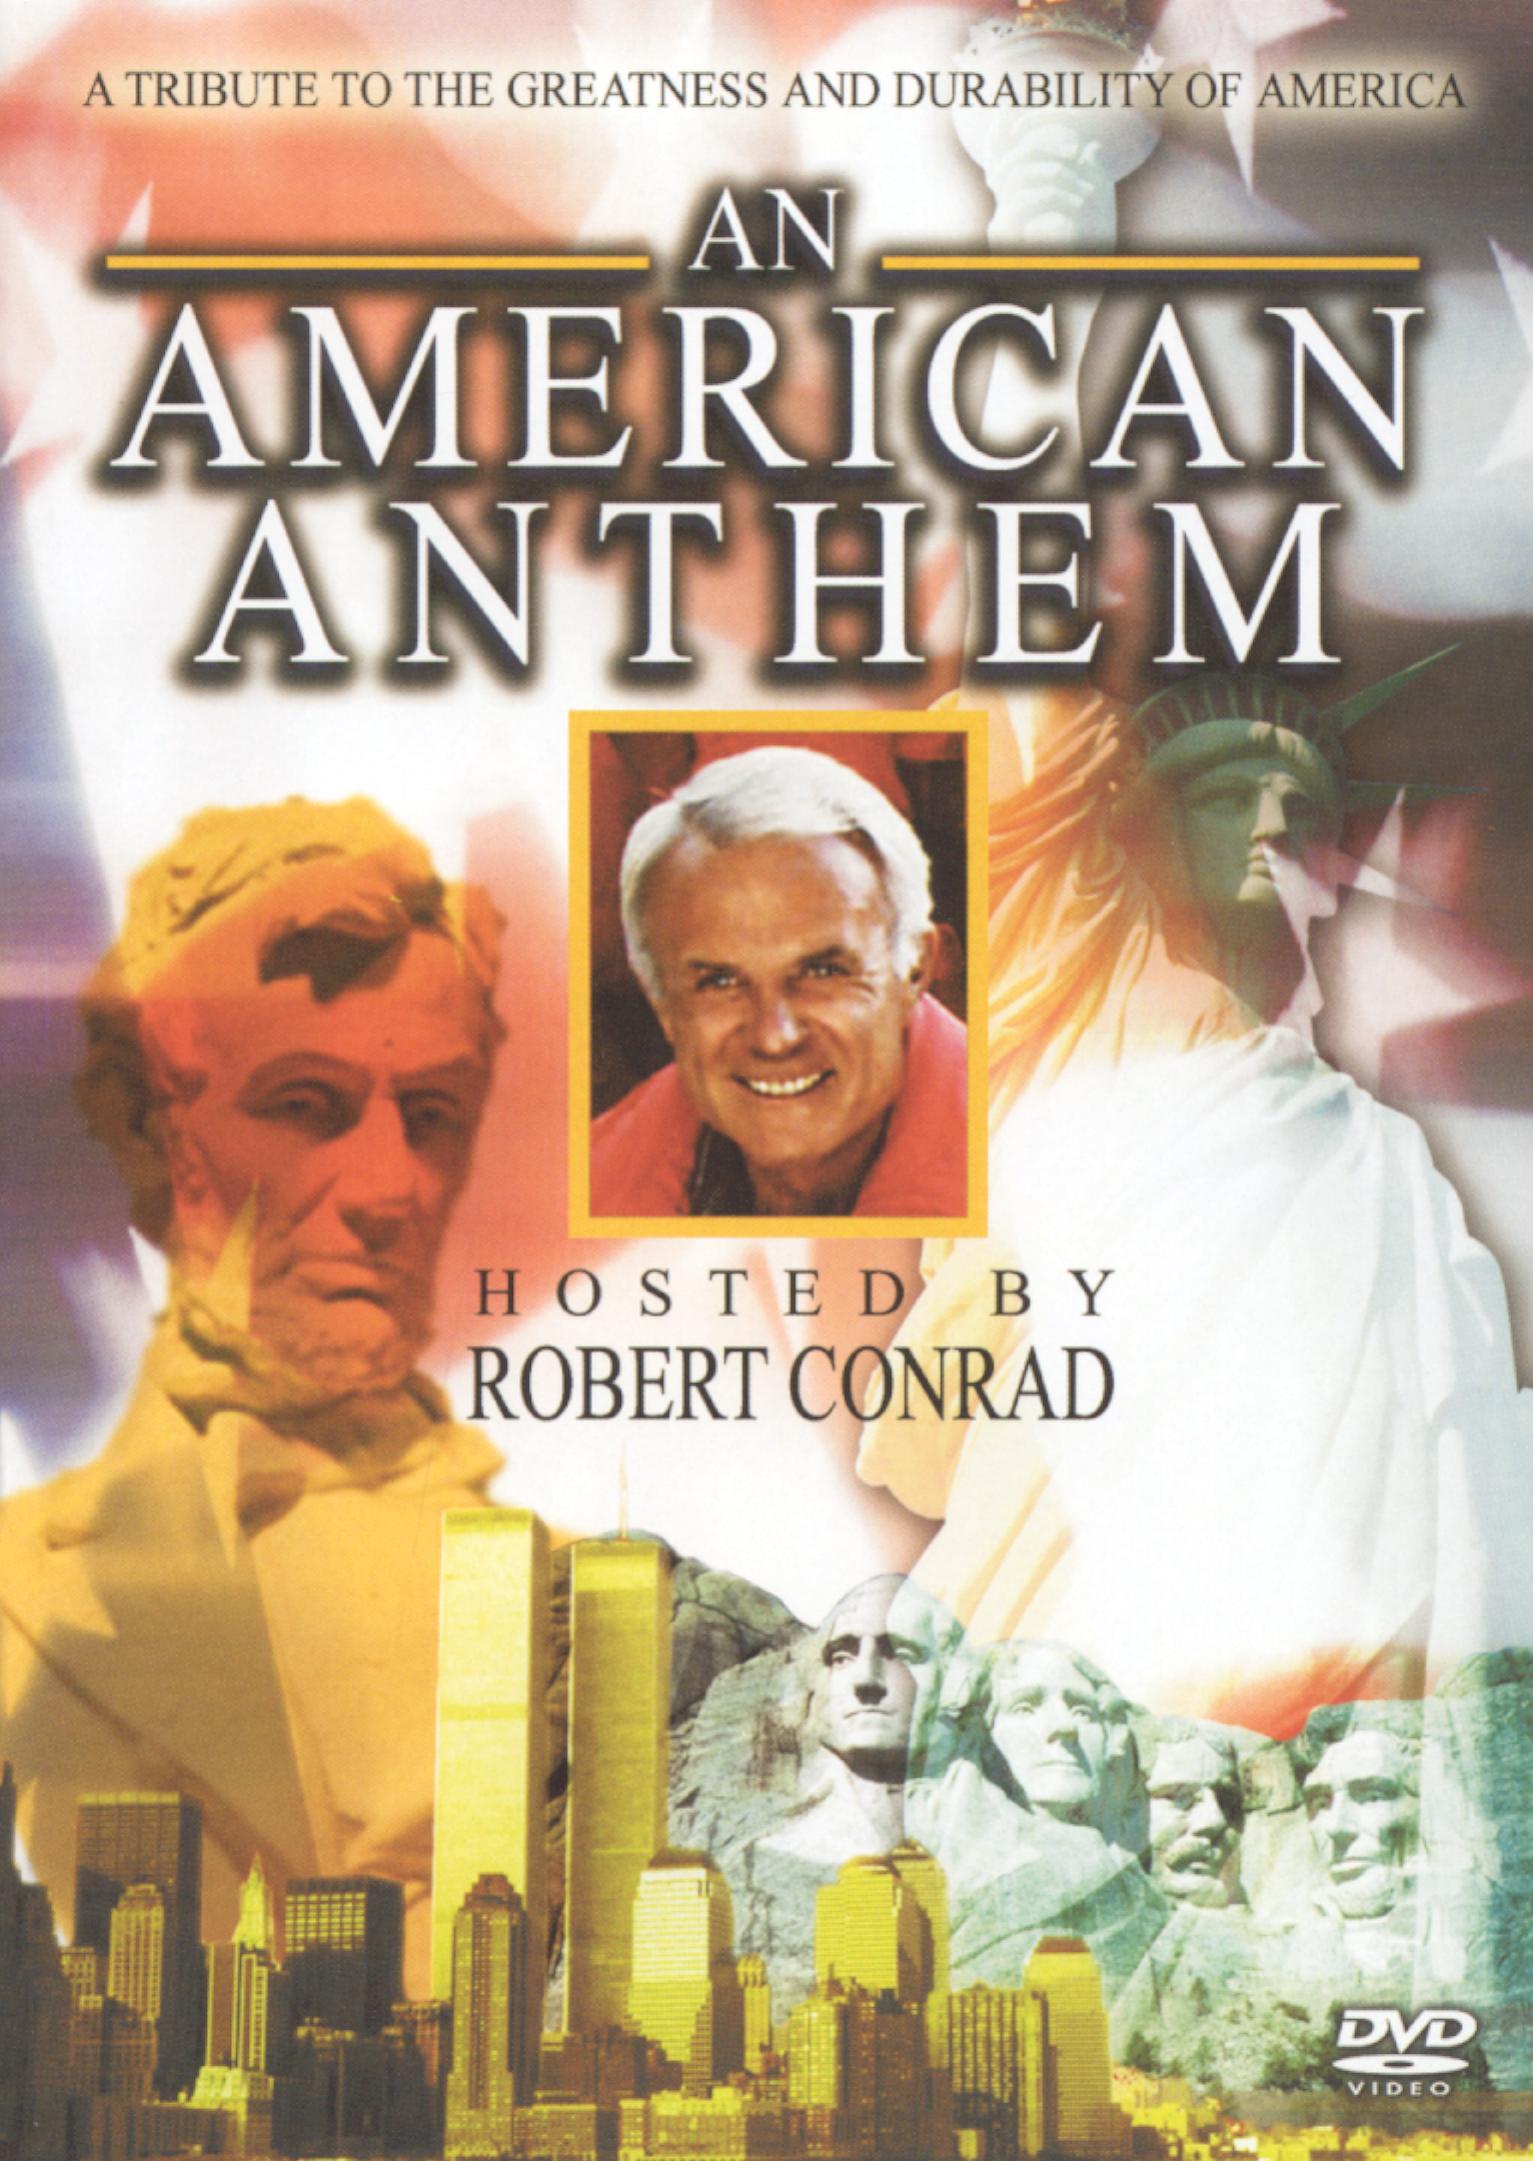 An American Anthem